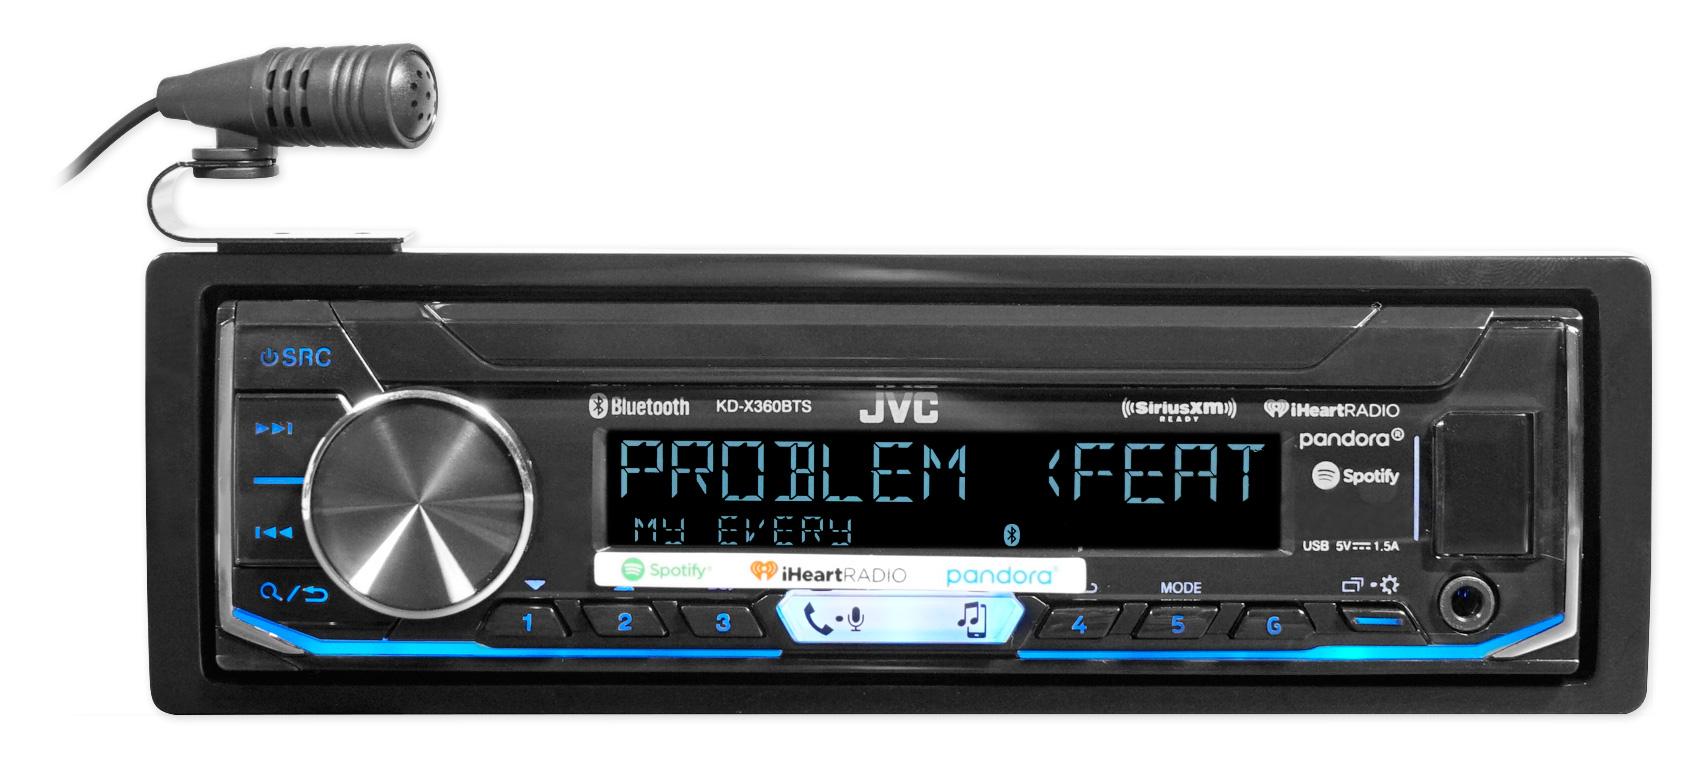 JVC Radio SiriusXM Bluetooth Dash Kit Harness For 03-06 Suzuki Grand Vitara XL7